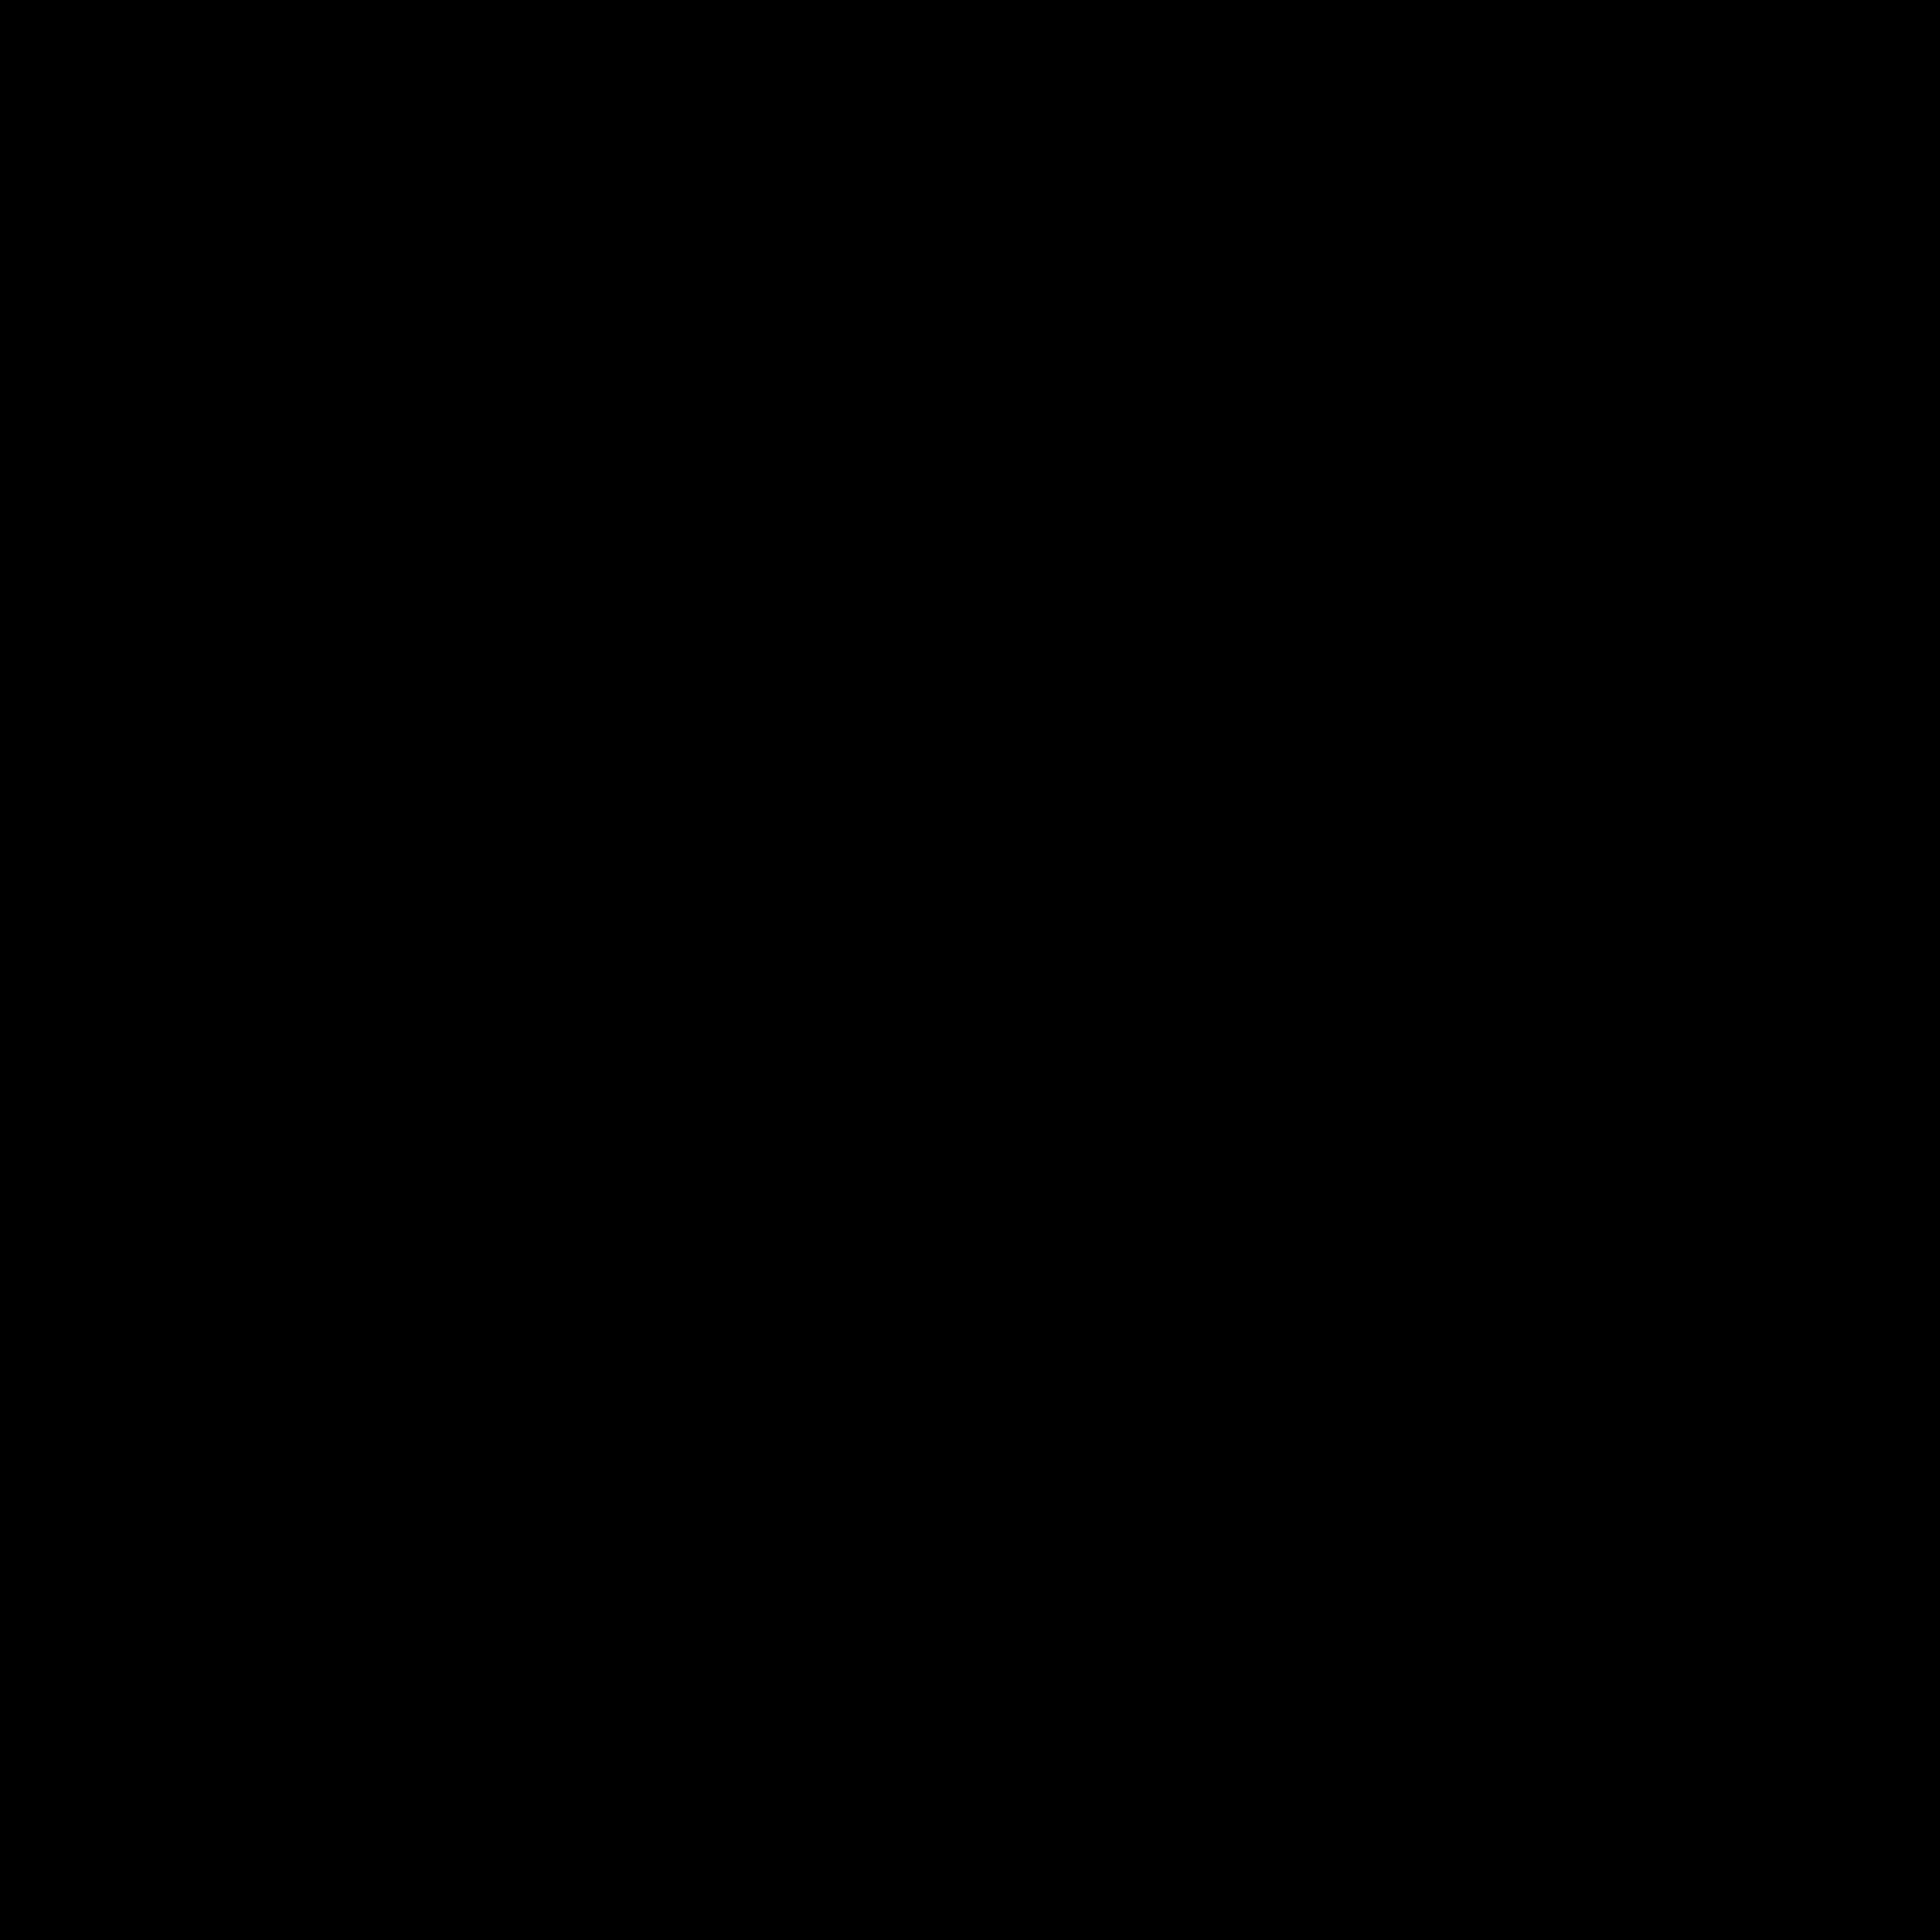 Plumbing logos clip art graphic Bobby L Greene Plumbing Logo PNG Transparent & SVG Vector - Freebie ... graphic